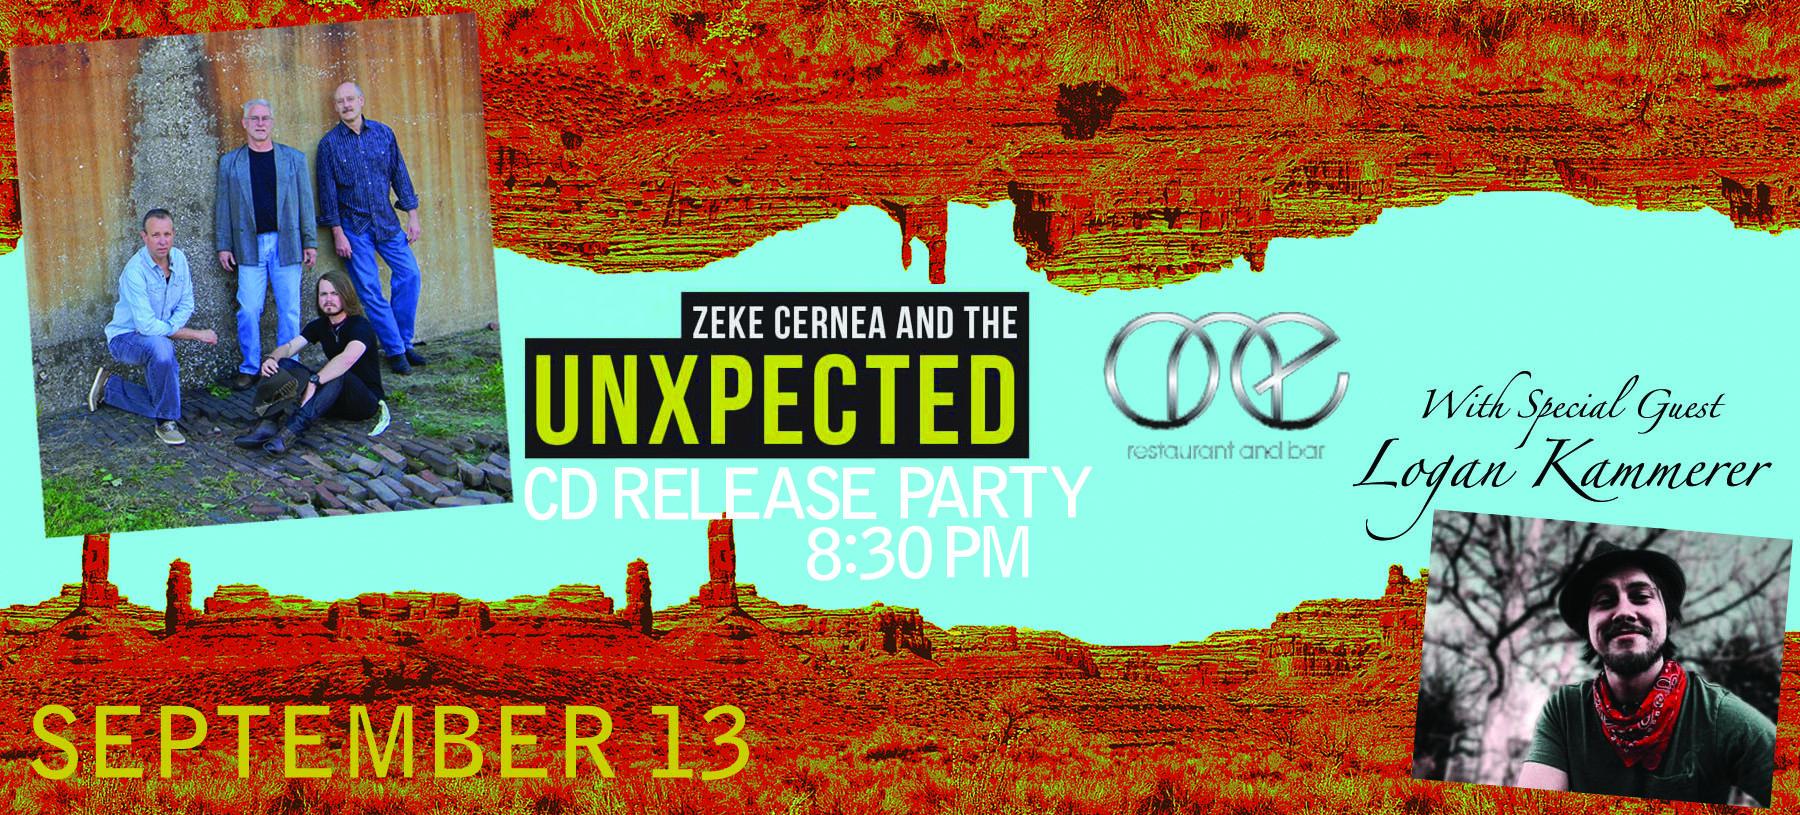 cd party flyer.jpg